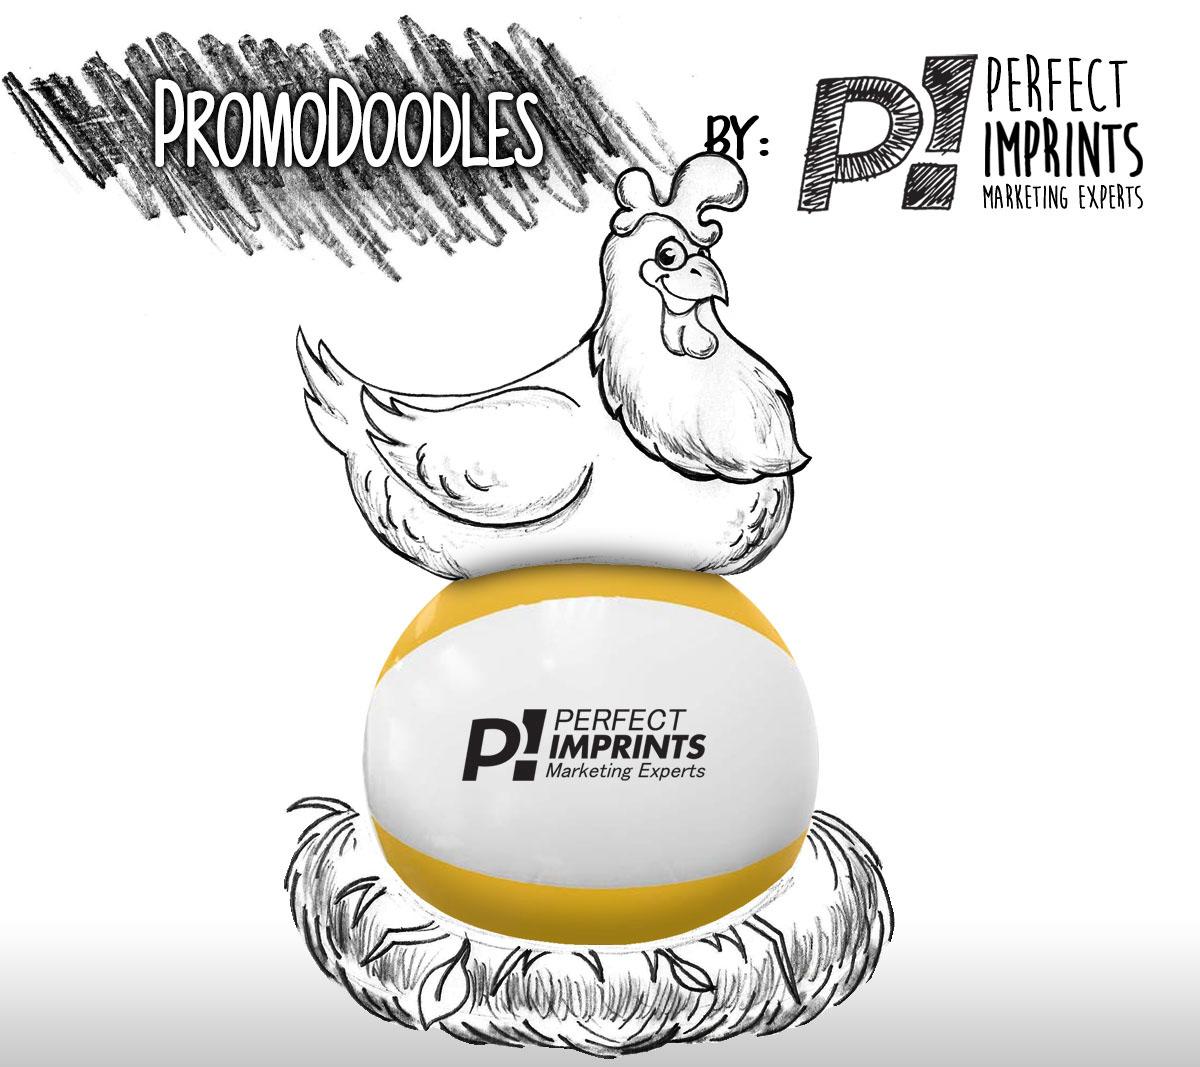 PromoDoodles by Perfect Imprints - Custom Beach Balls